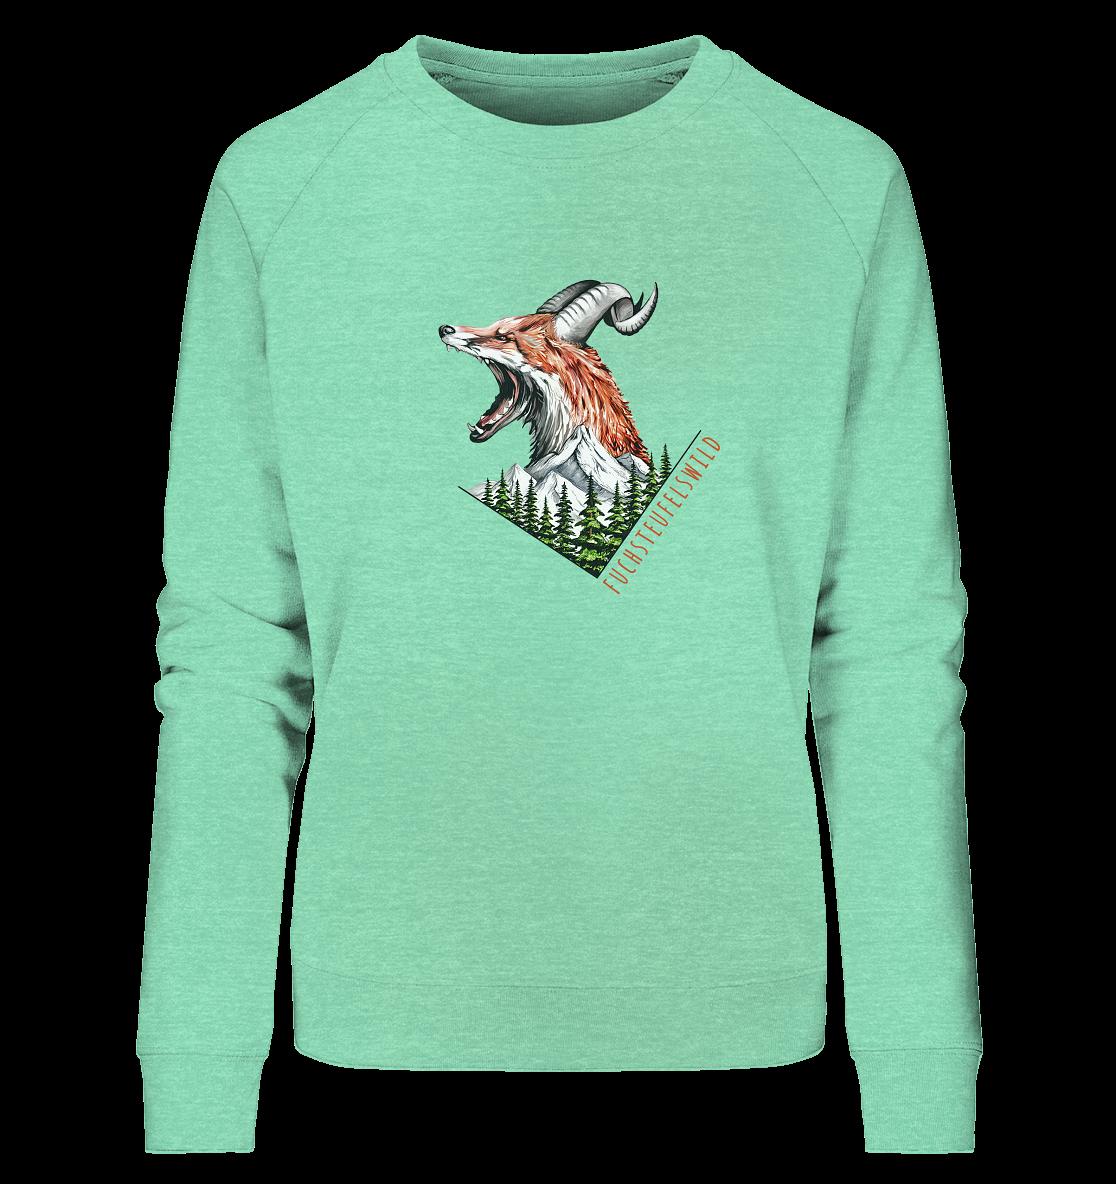 front-ladies-organic-sweatshirt-84e5bd-1116x-1.png